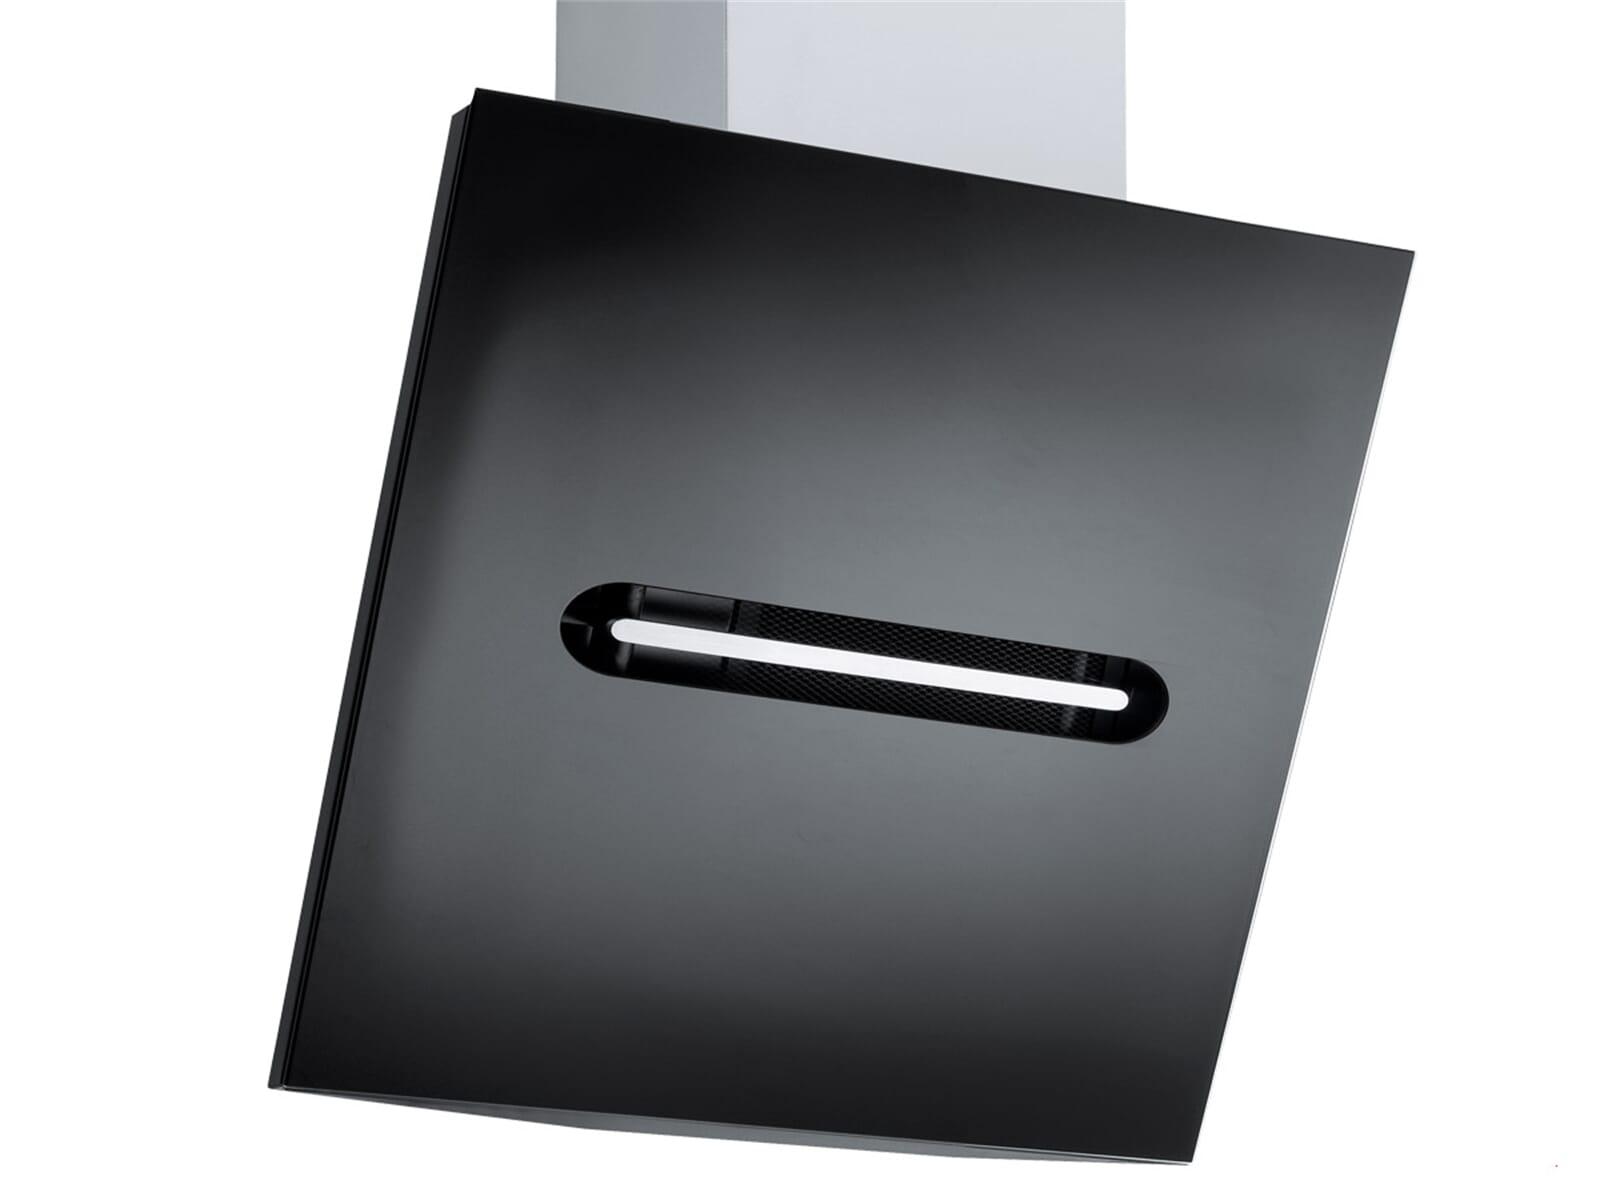 kopffreihaube glas. Black Bedroom Furniture Sets. Home Design Ideas